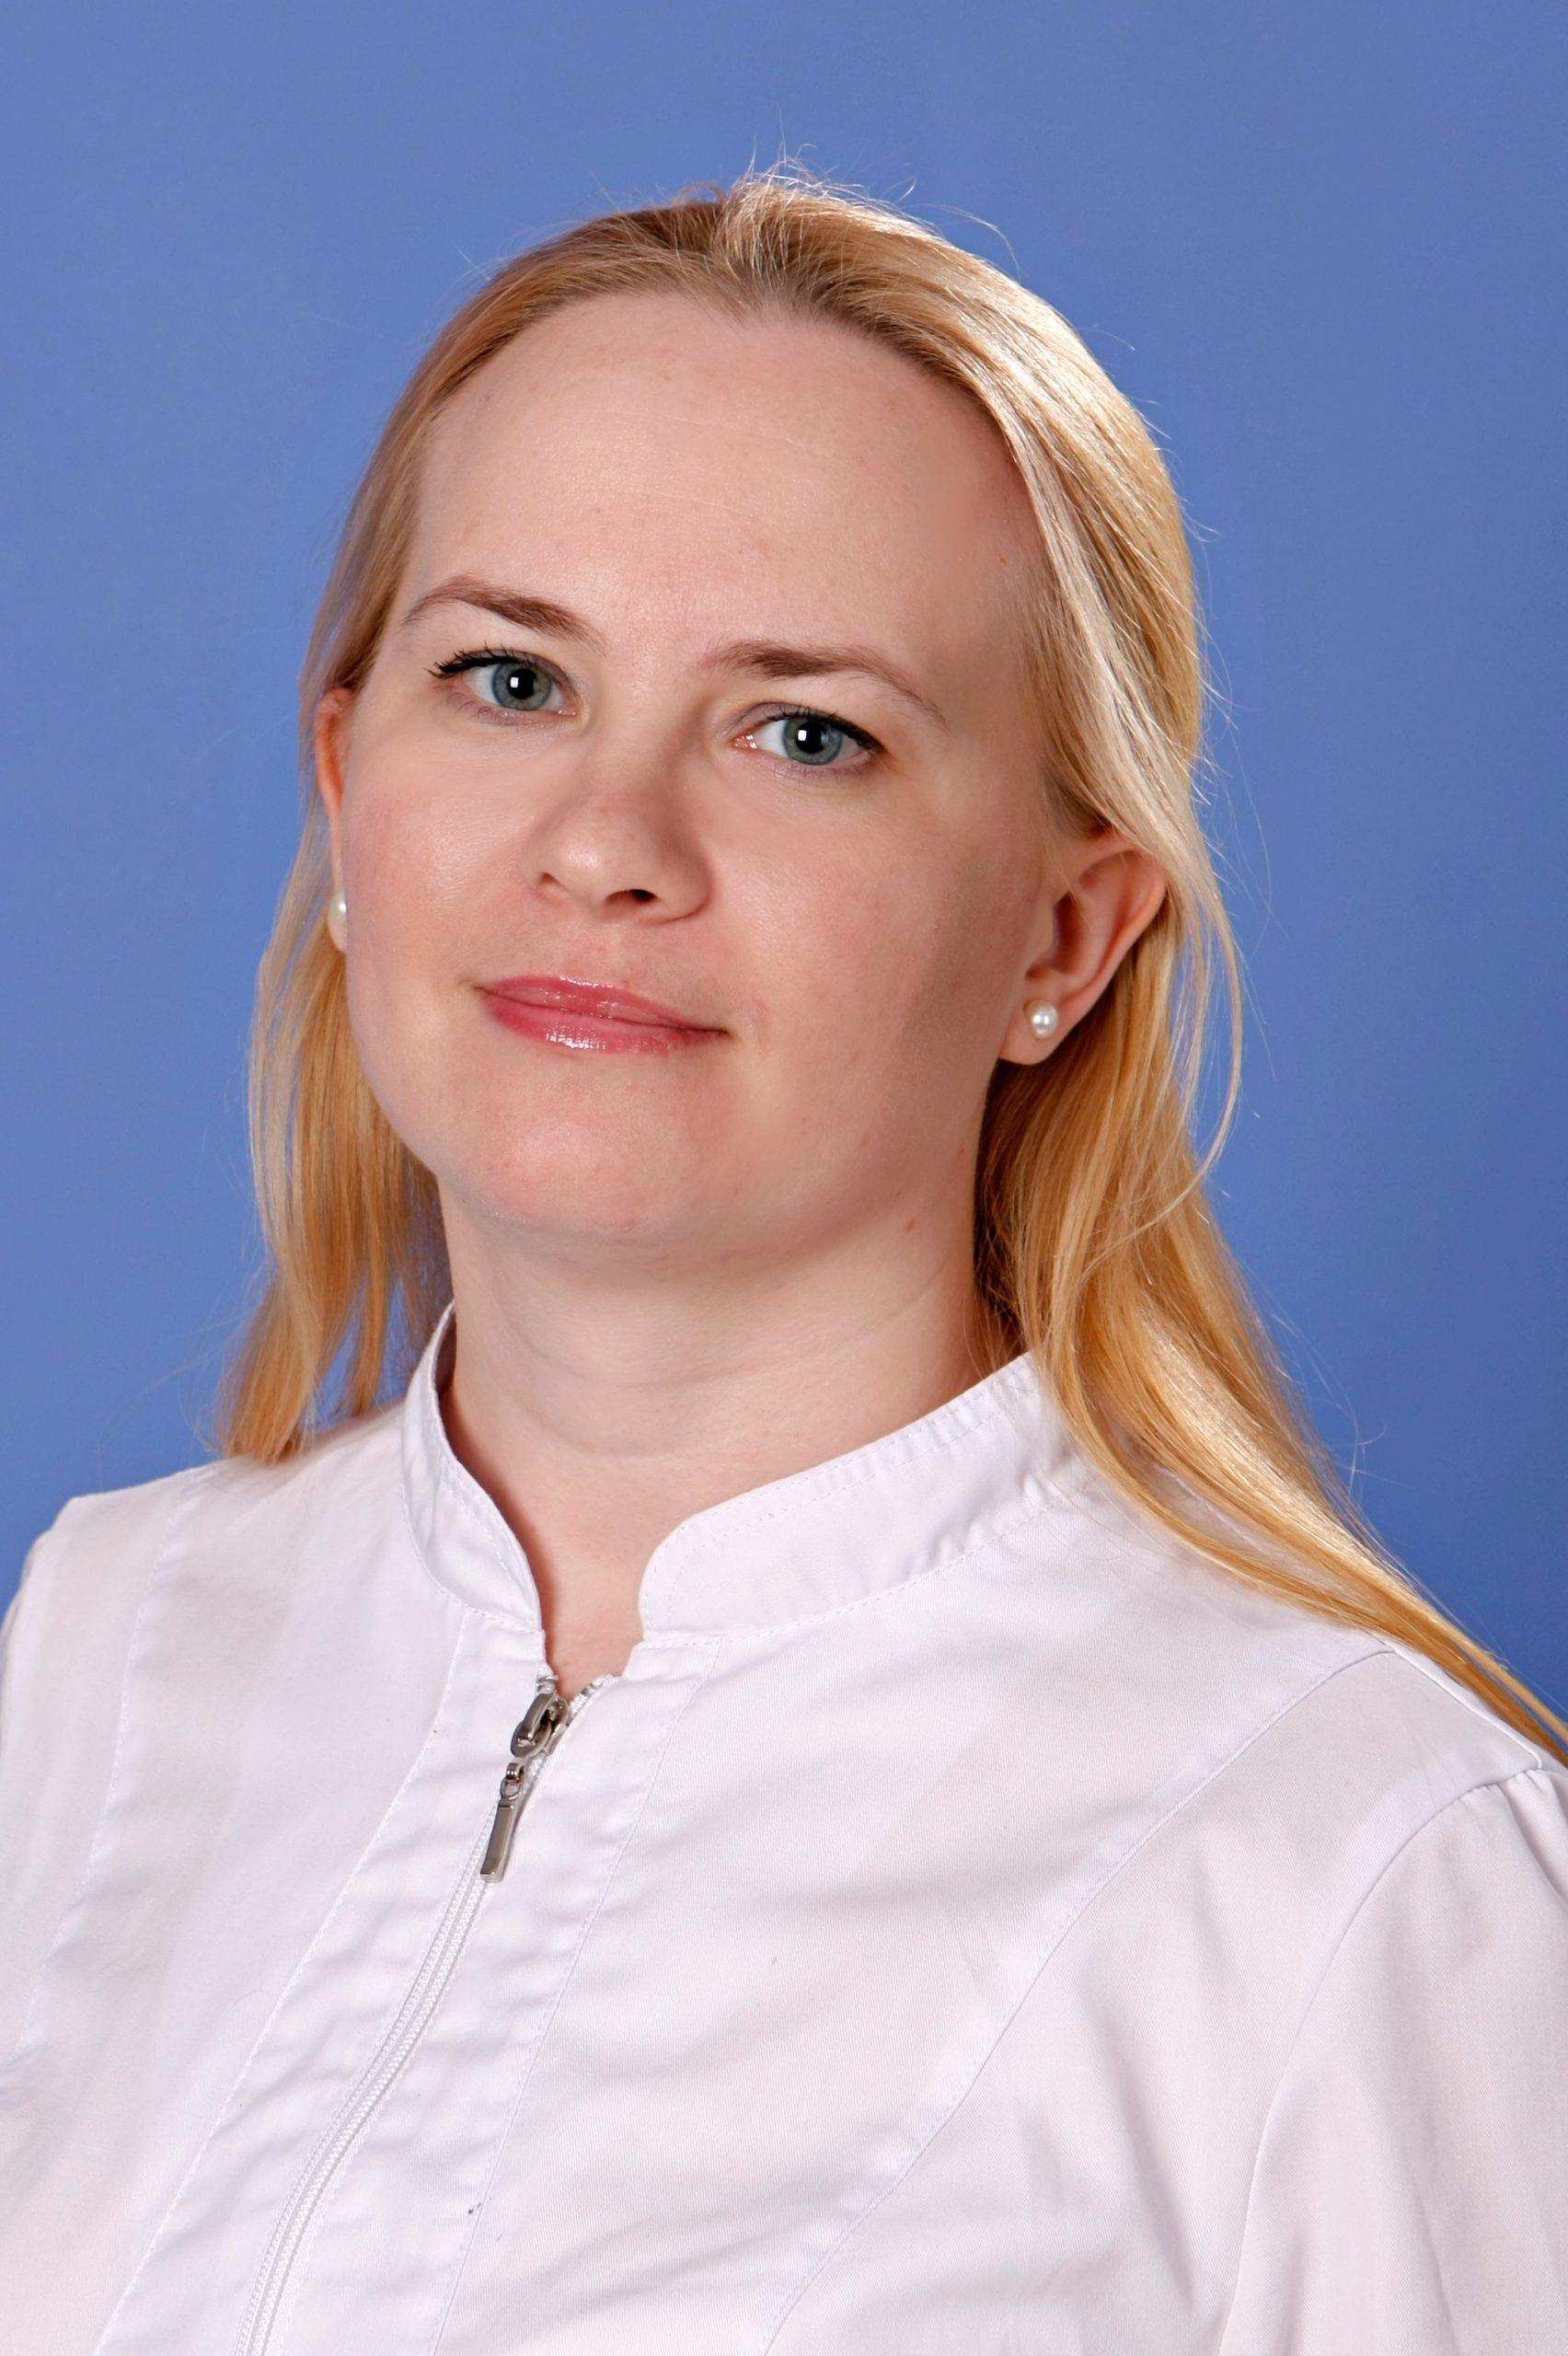 Гусева Анна Викторовна, стоматолог-ортодонт